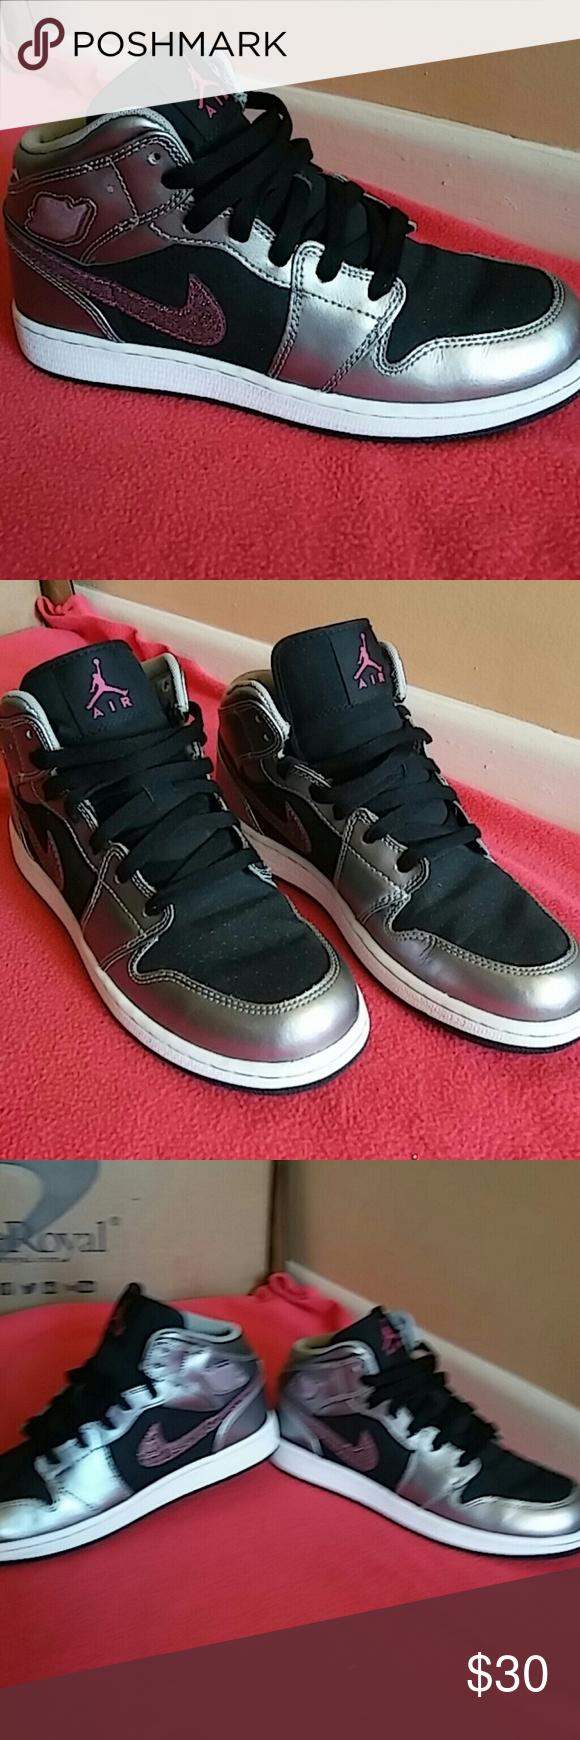 Nike Air Jordan 1 Phat Yellow/Black Size 10 Great Condition